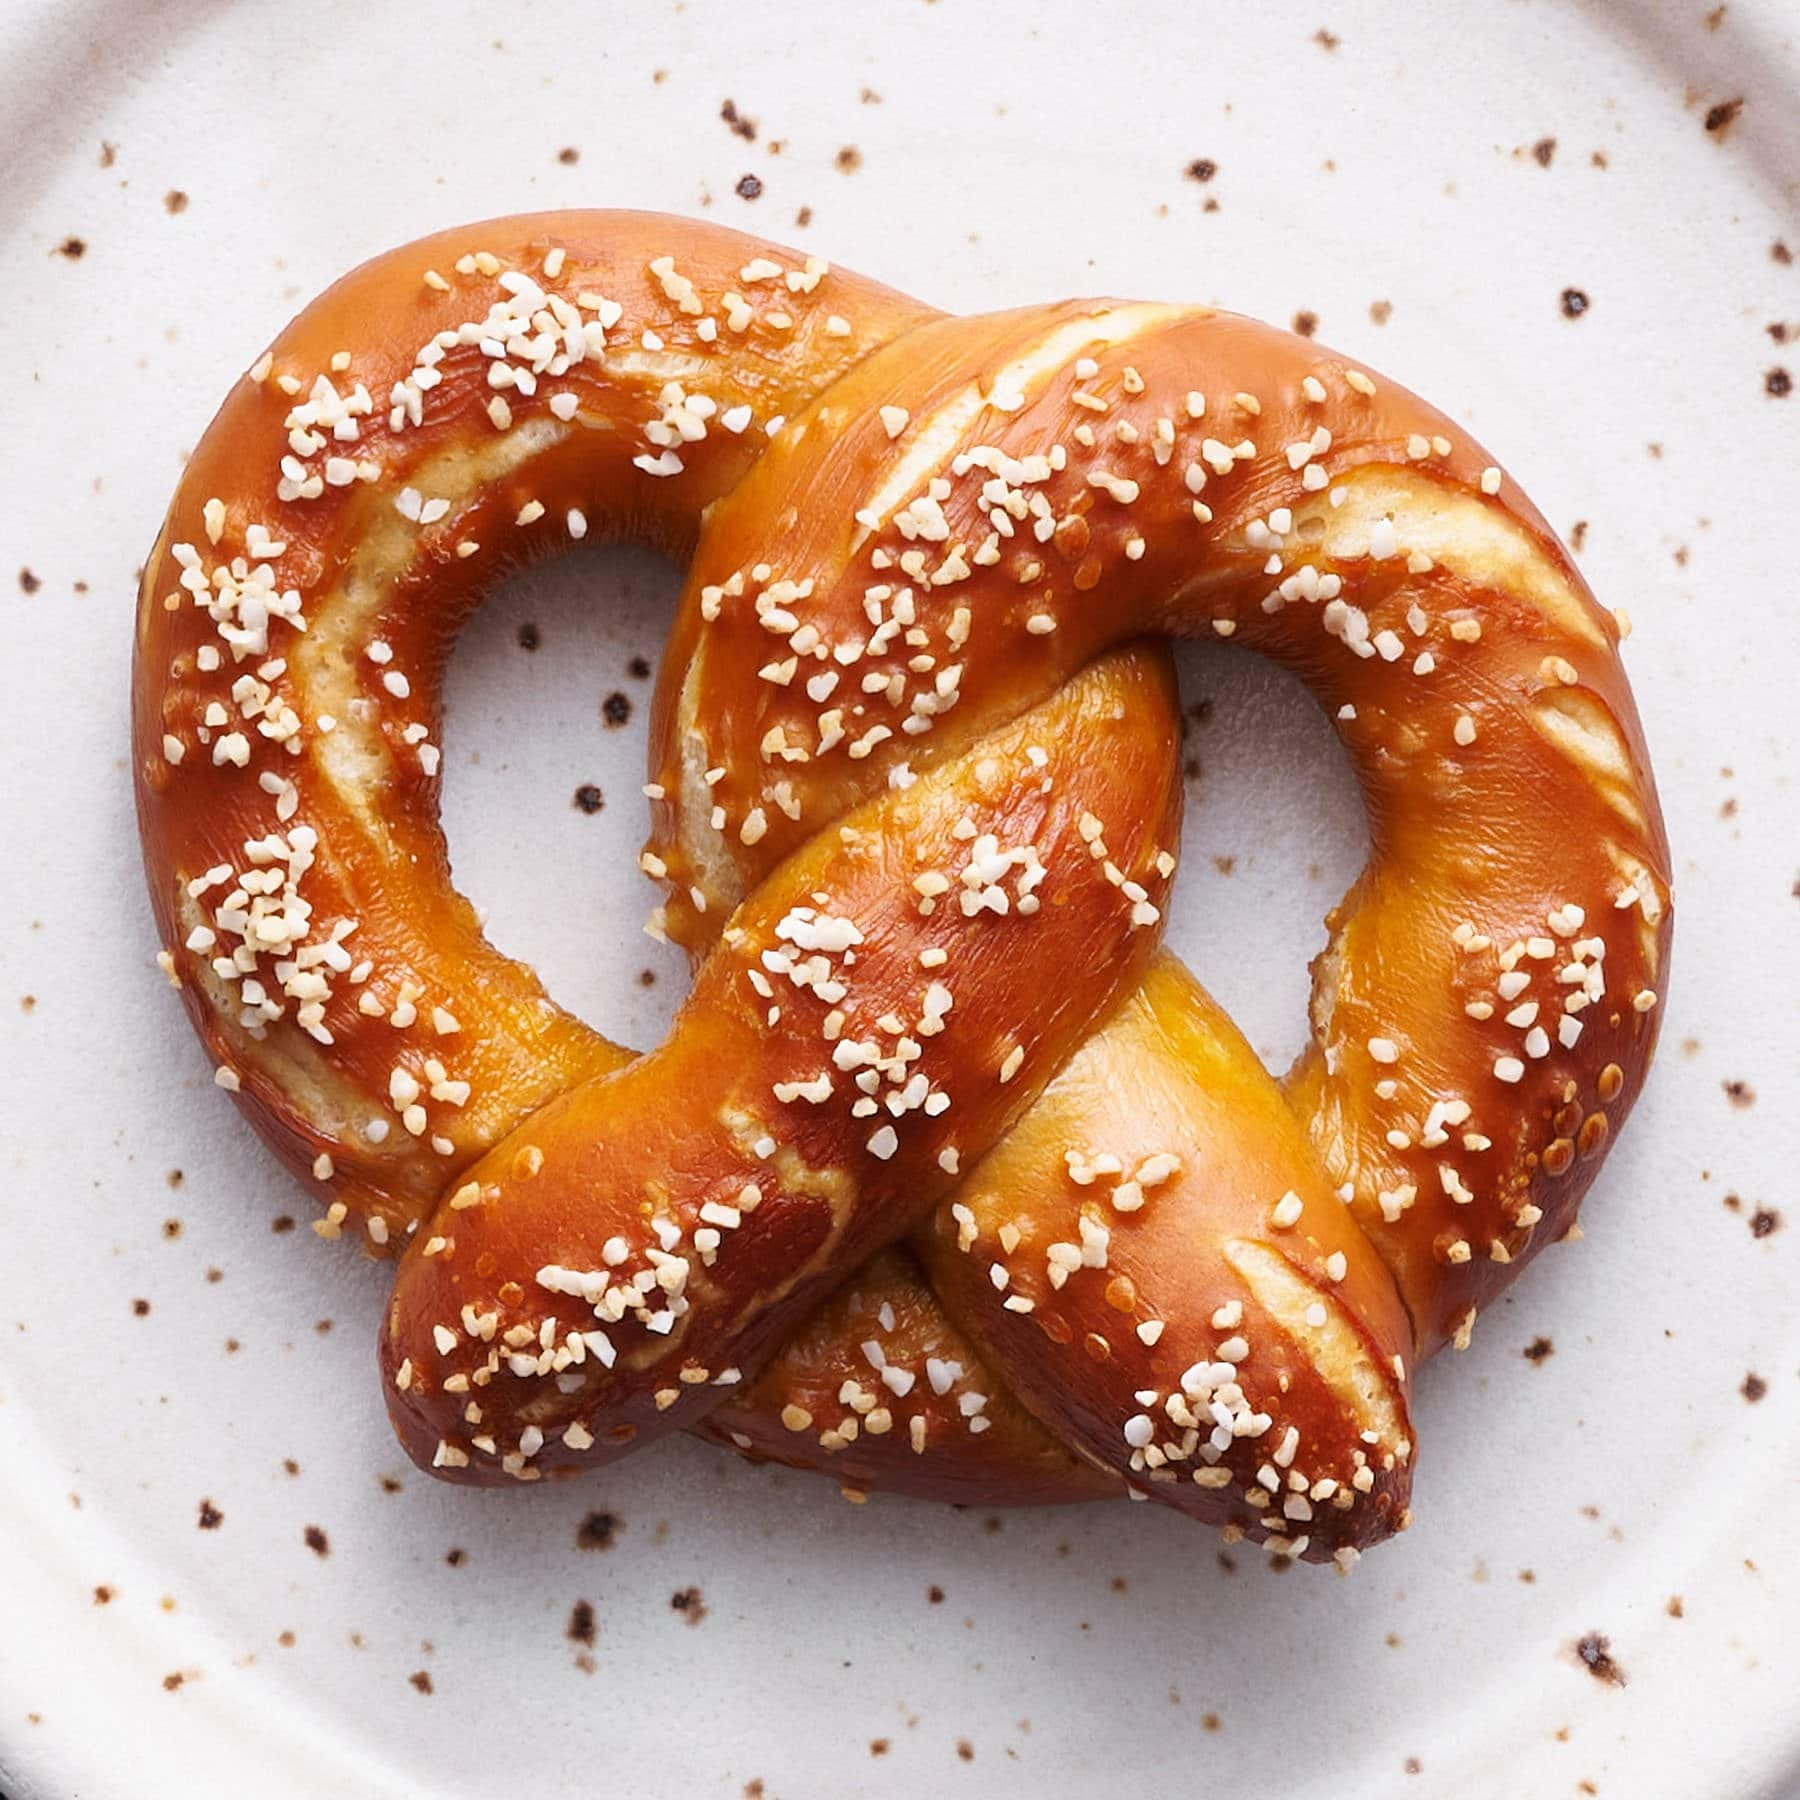 homemade german pretzel recipe with salt on a plate